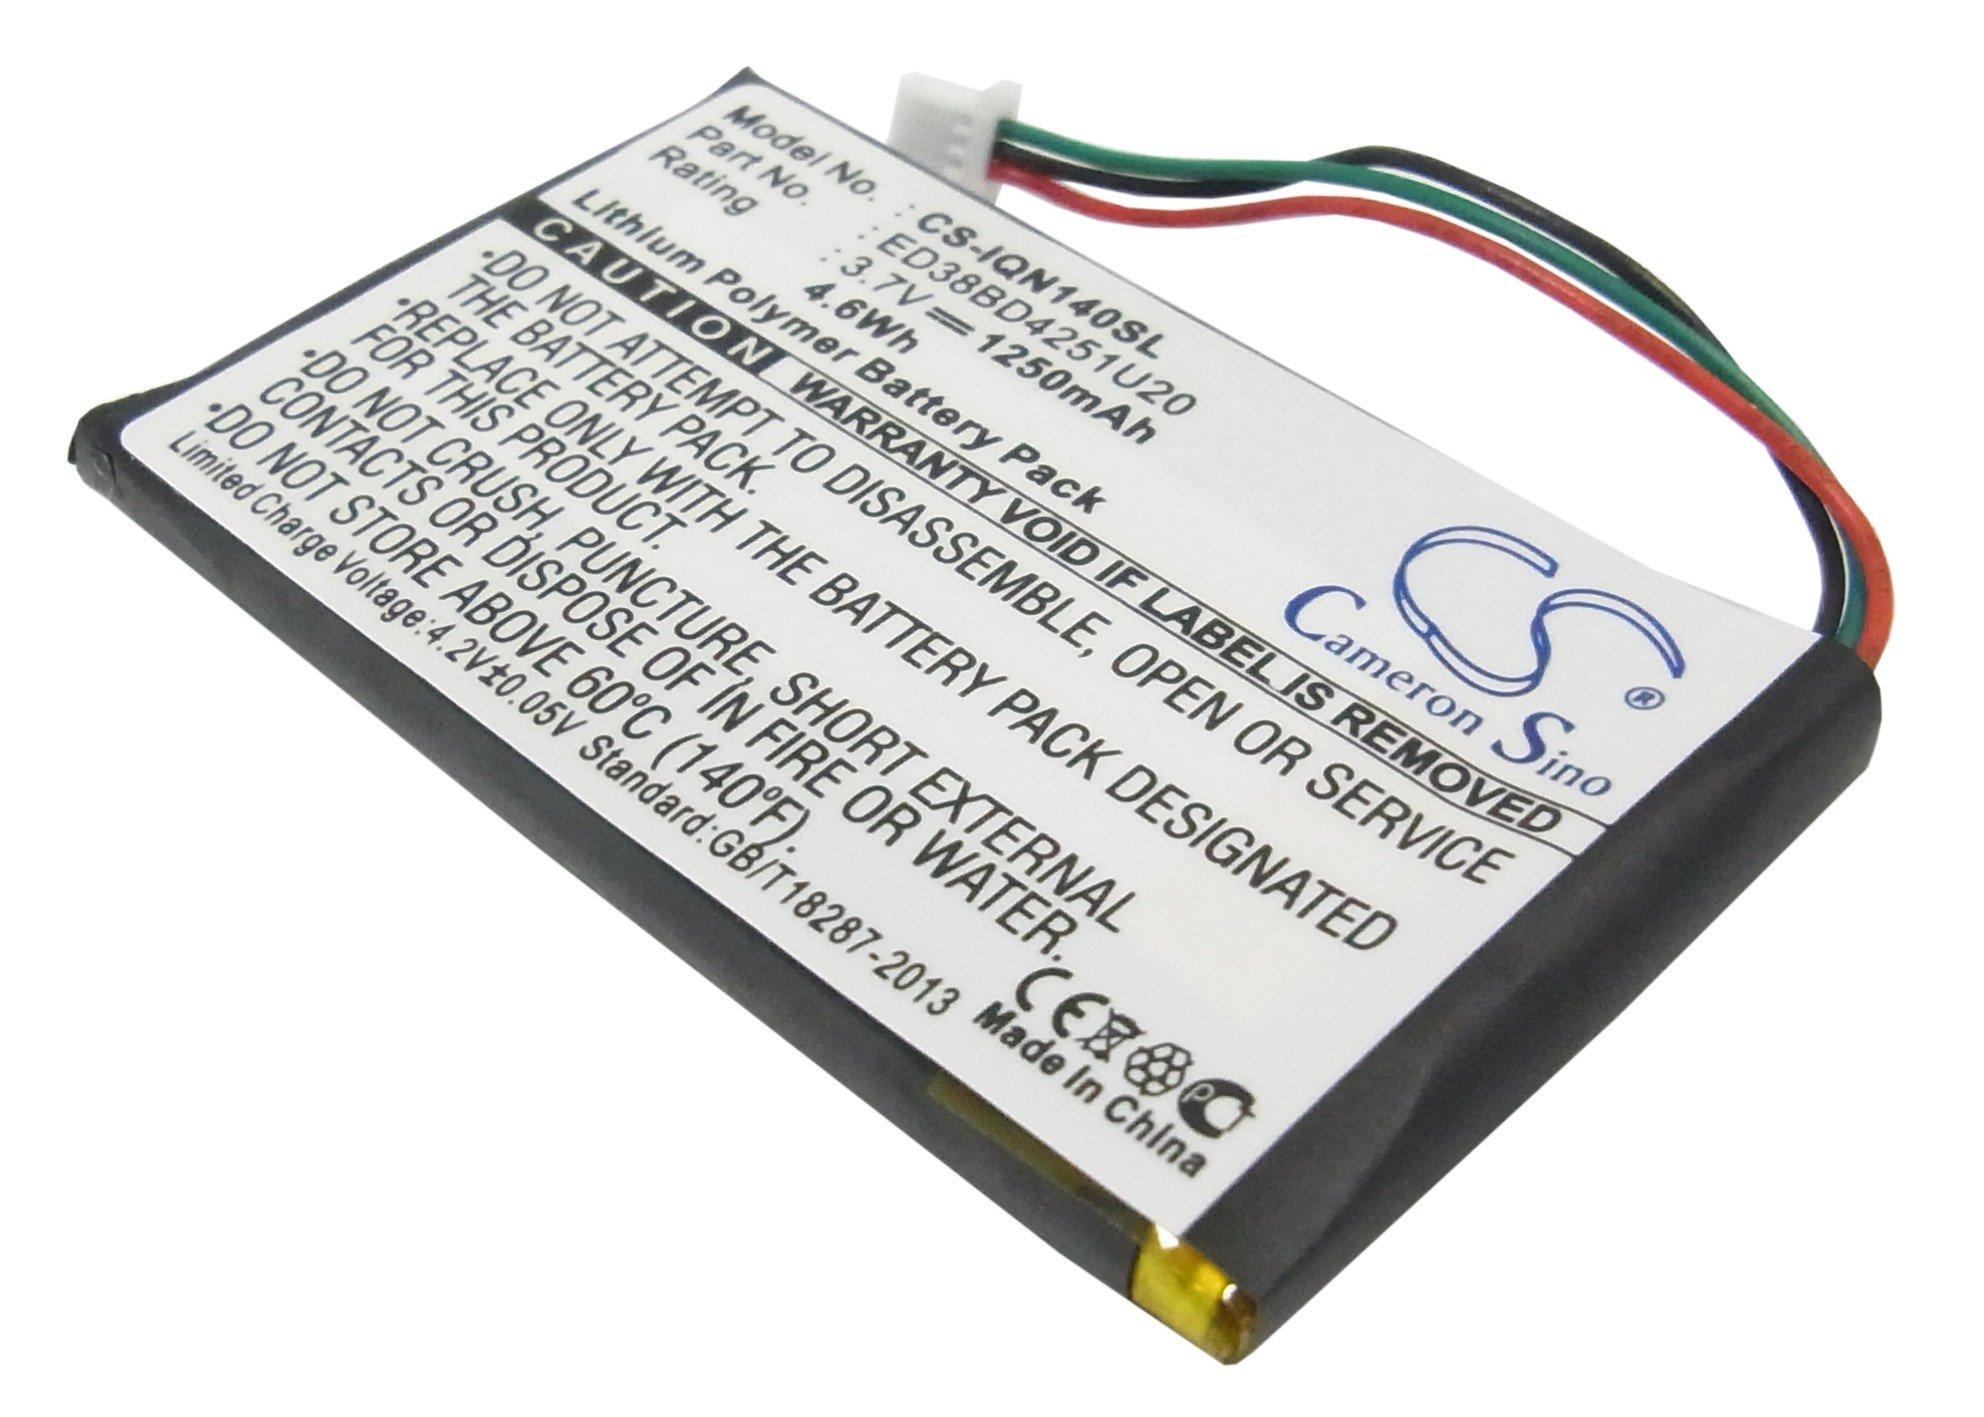 Cameron Sino Аккумулятор для GPS-навигатора Garmin 361-00019-16, ED38BD4251U20 3,7V 1250mAh код 008.01002